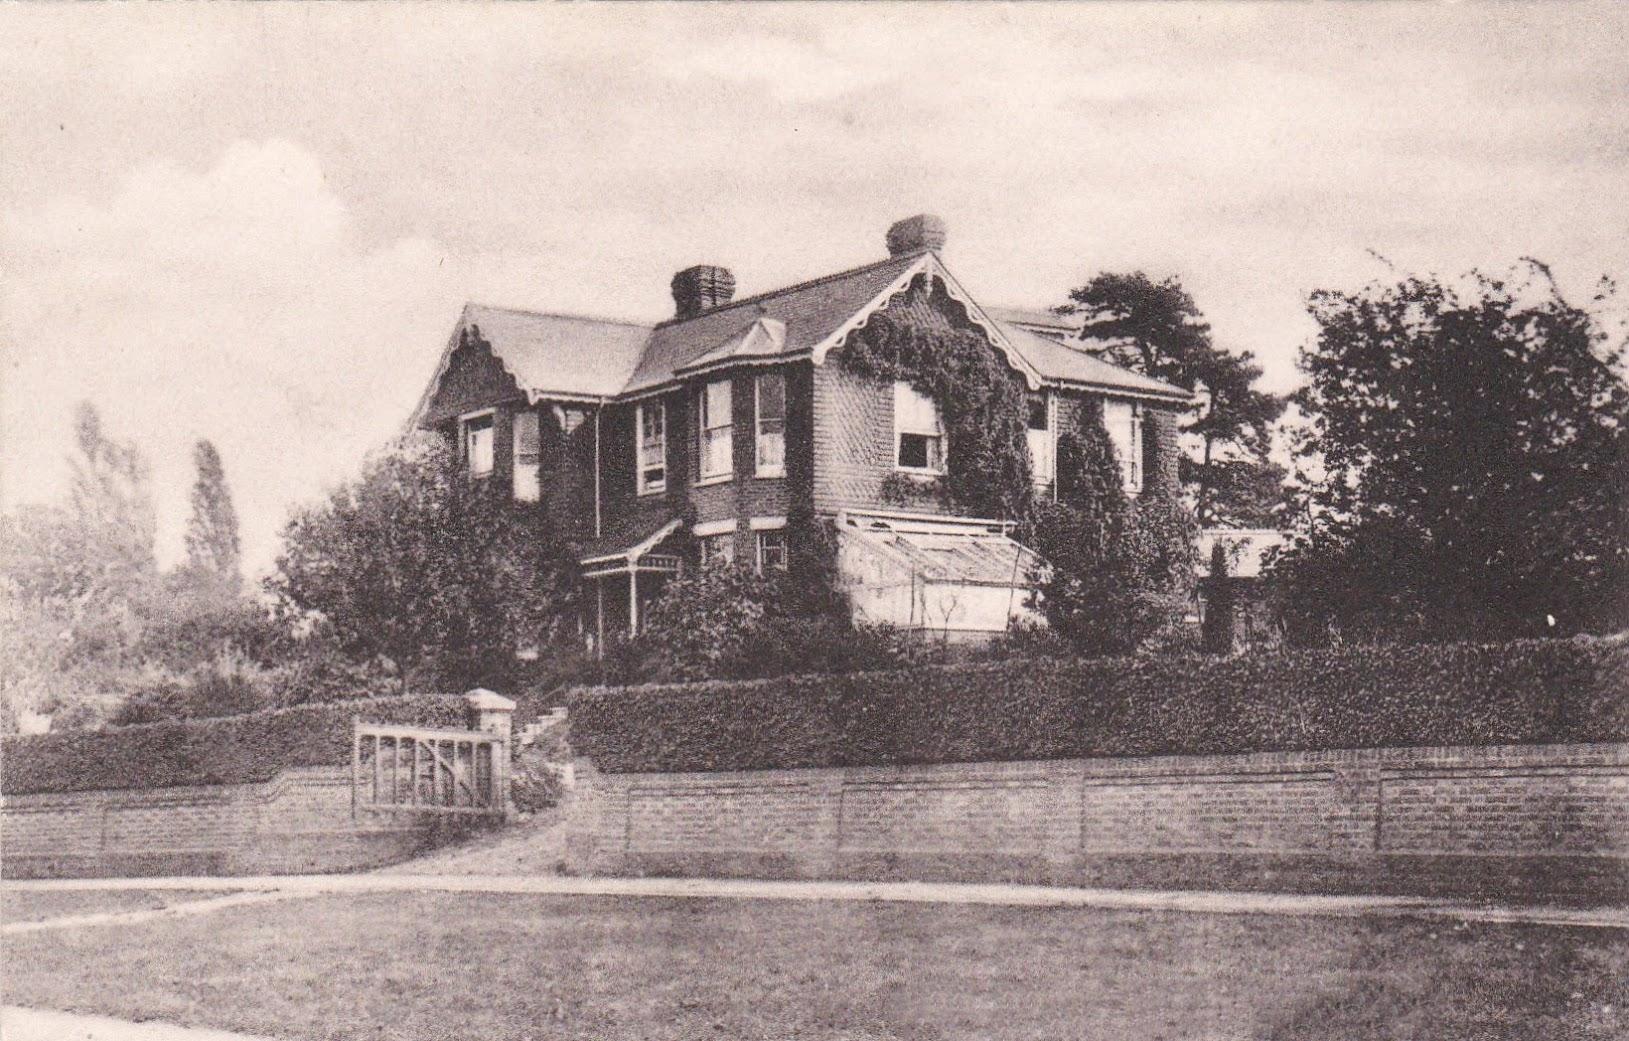 Tenterden Girls School, Beacon Oak House, 1905